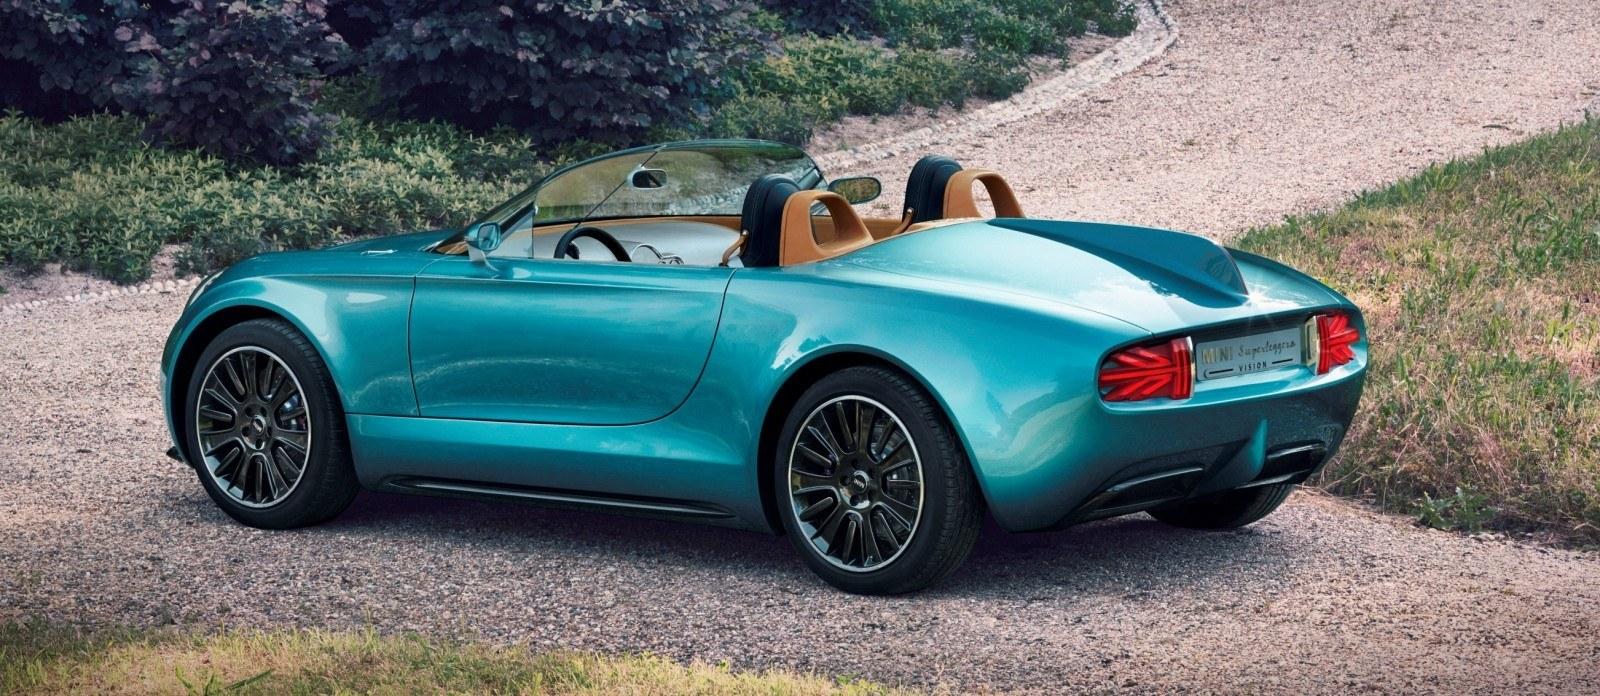 2014 MINI Superleggera Concept is Dreamy Roofless Speedster2